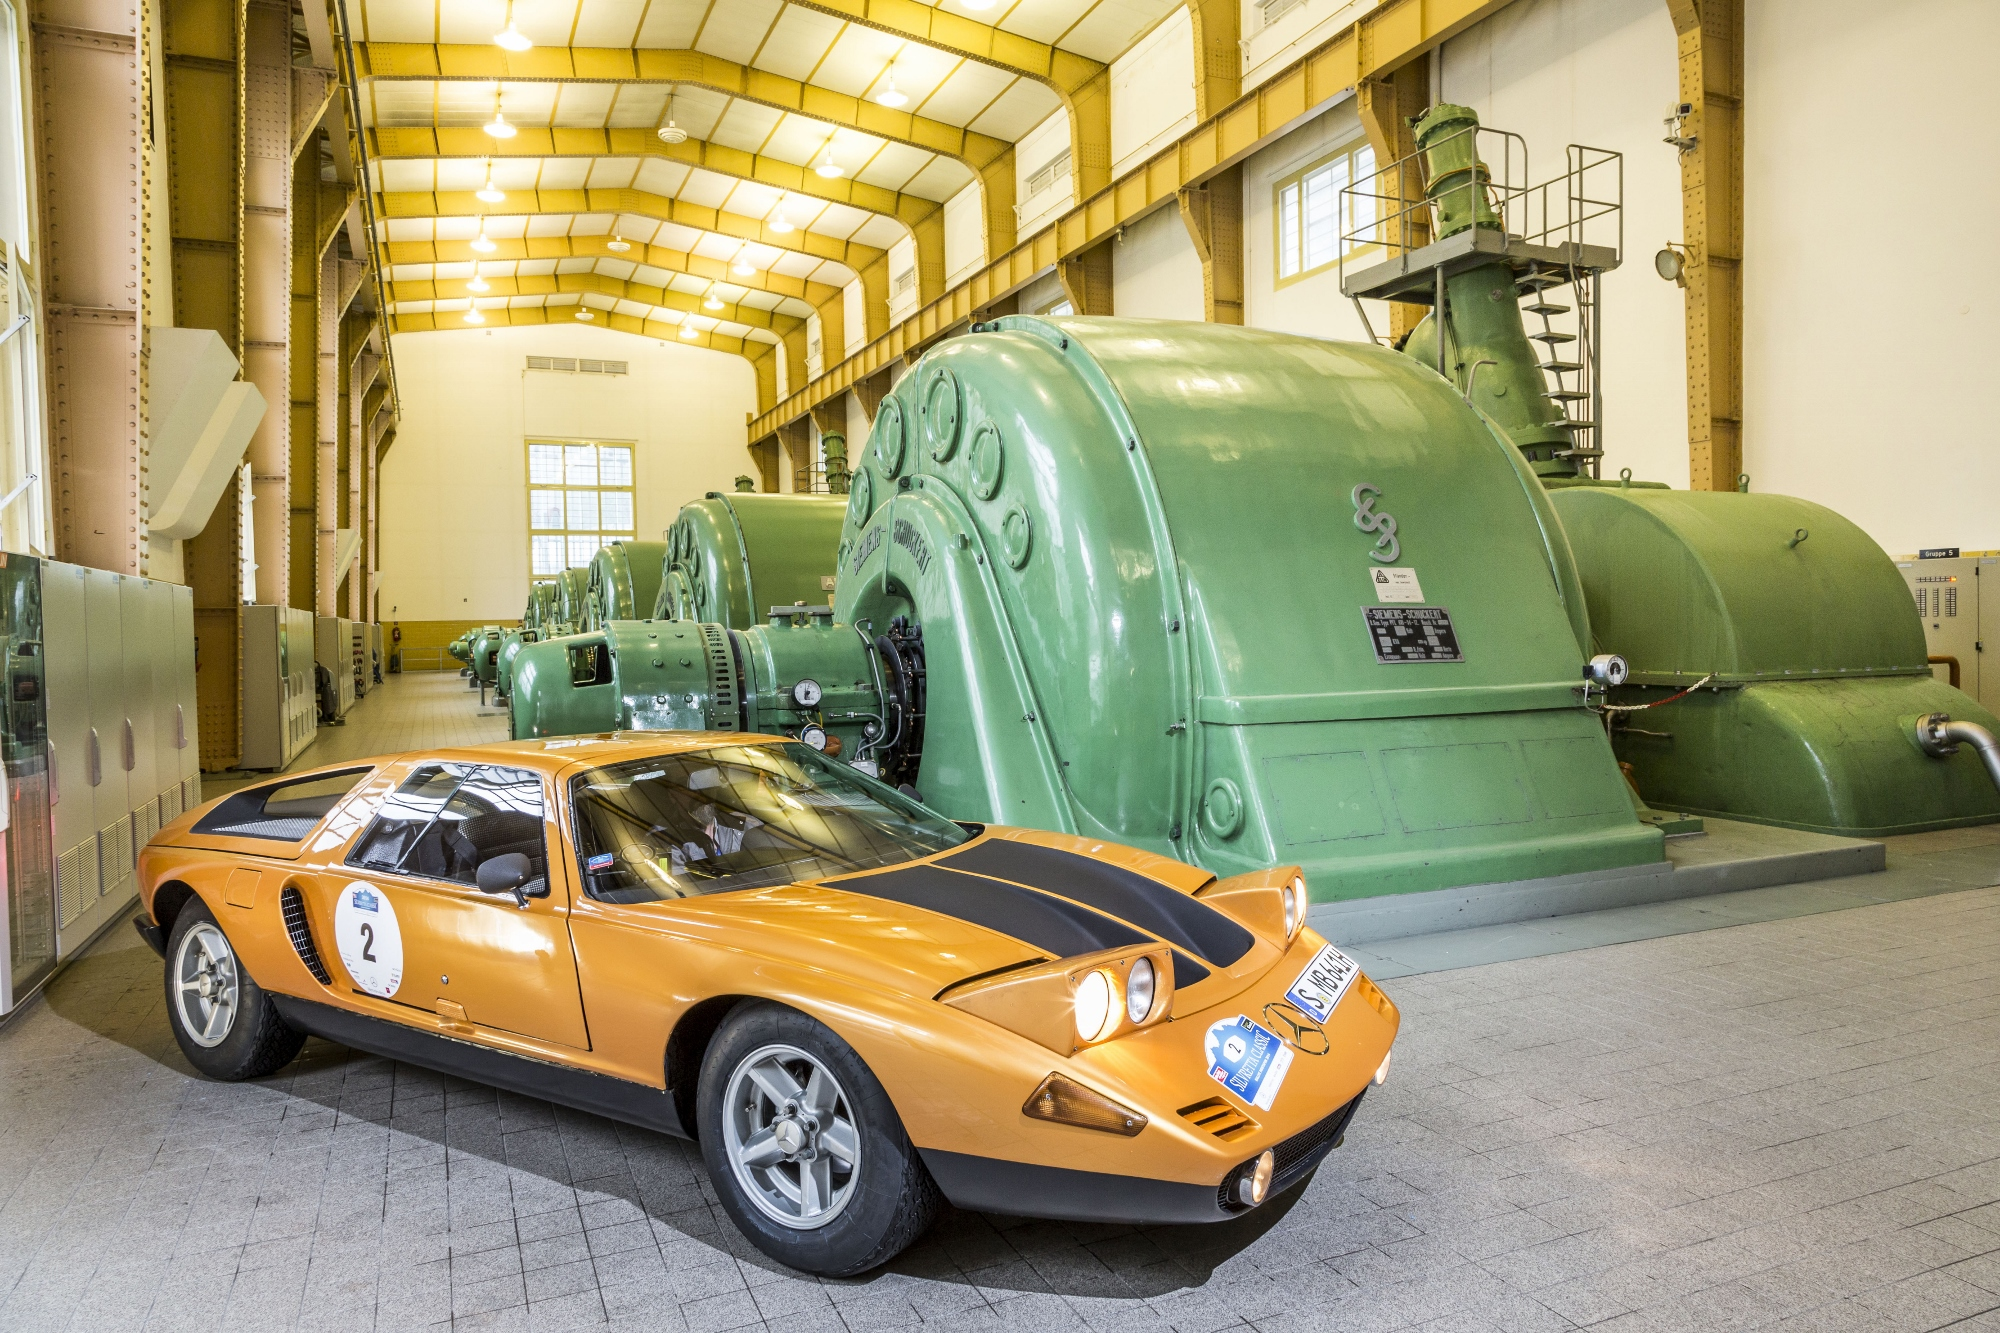 Mercedes C 111-II: premiéra pred 50 rokmi na ženevskom autosalóne 1970 xgP5c0zR3B mercedes-c111-ii-5